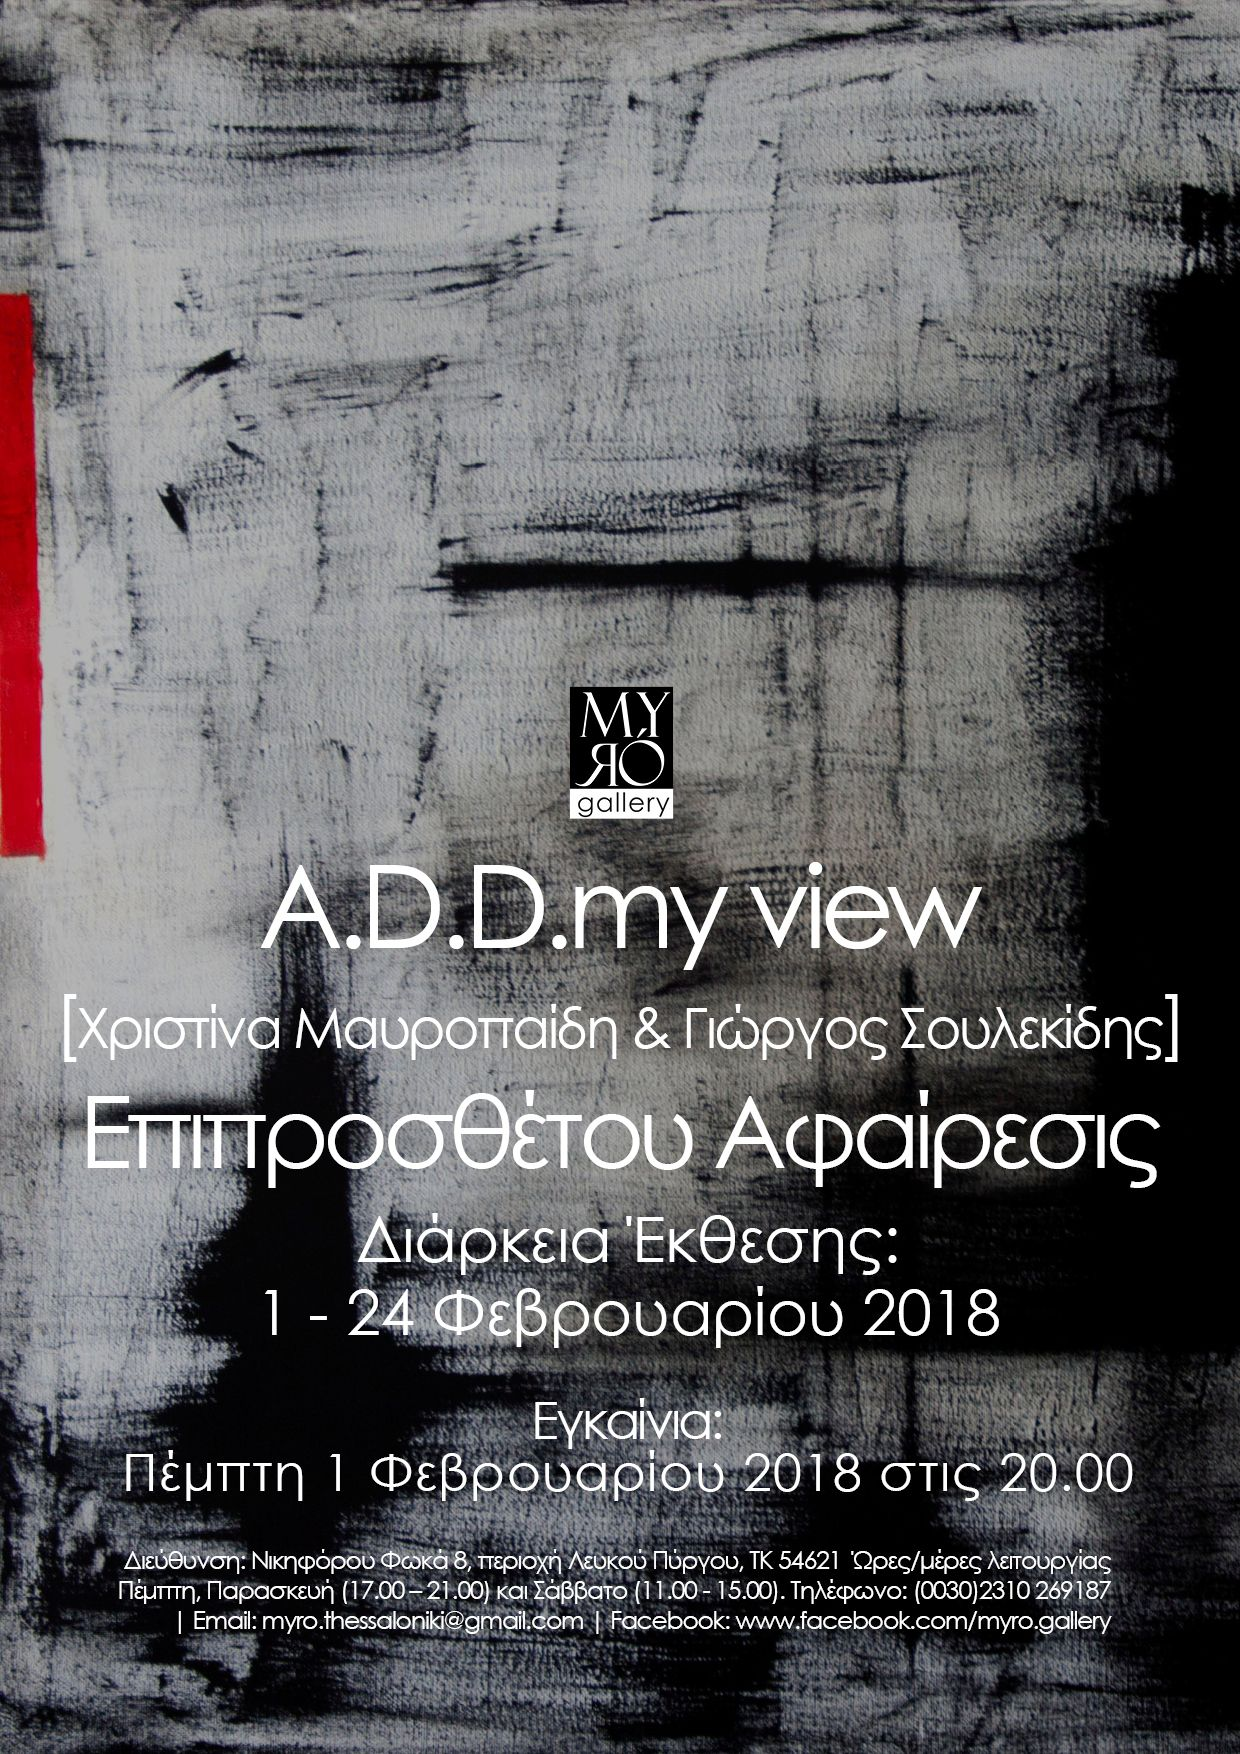 Myro Invitation ADDMyView